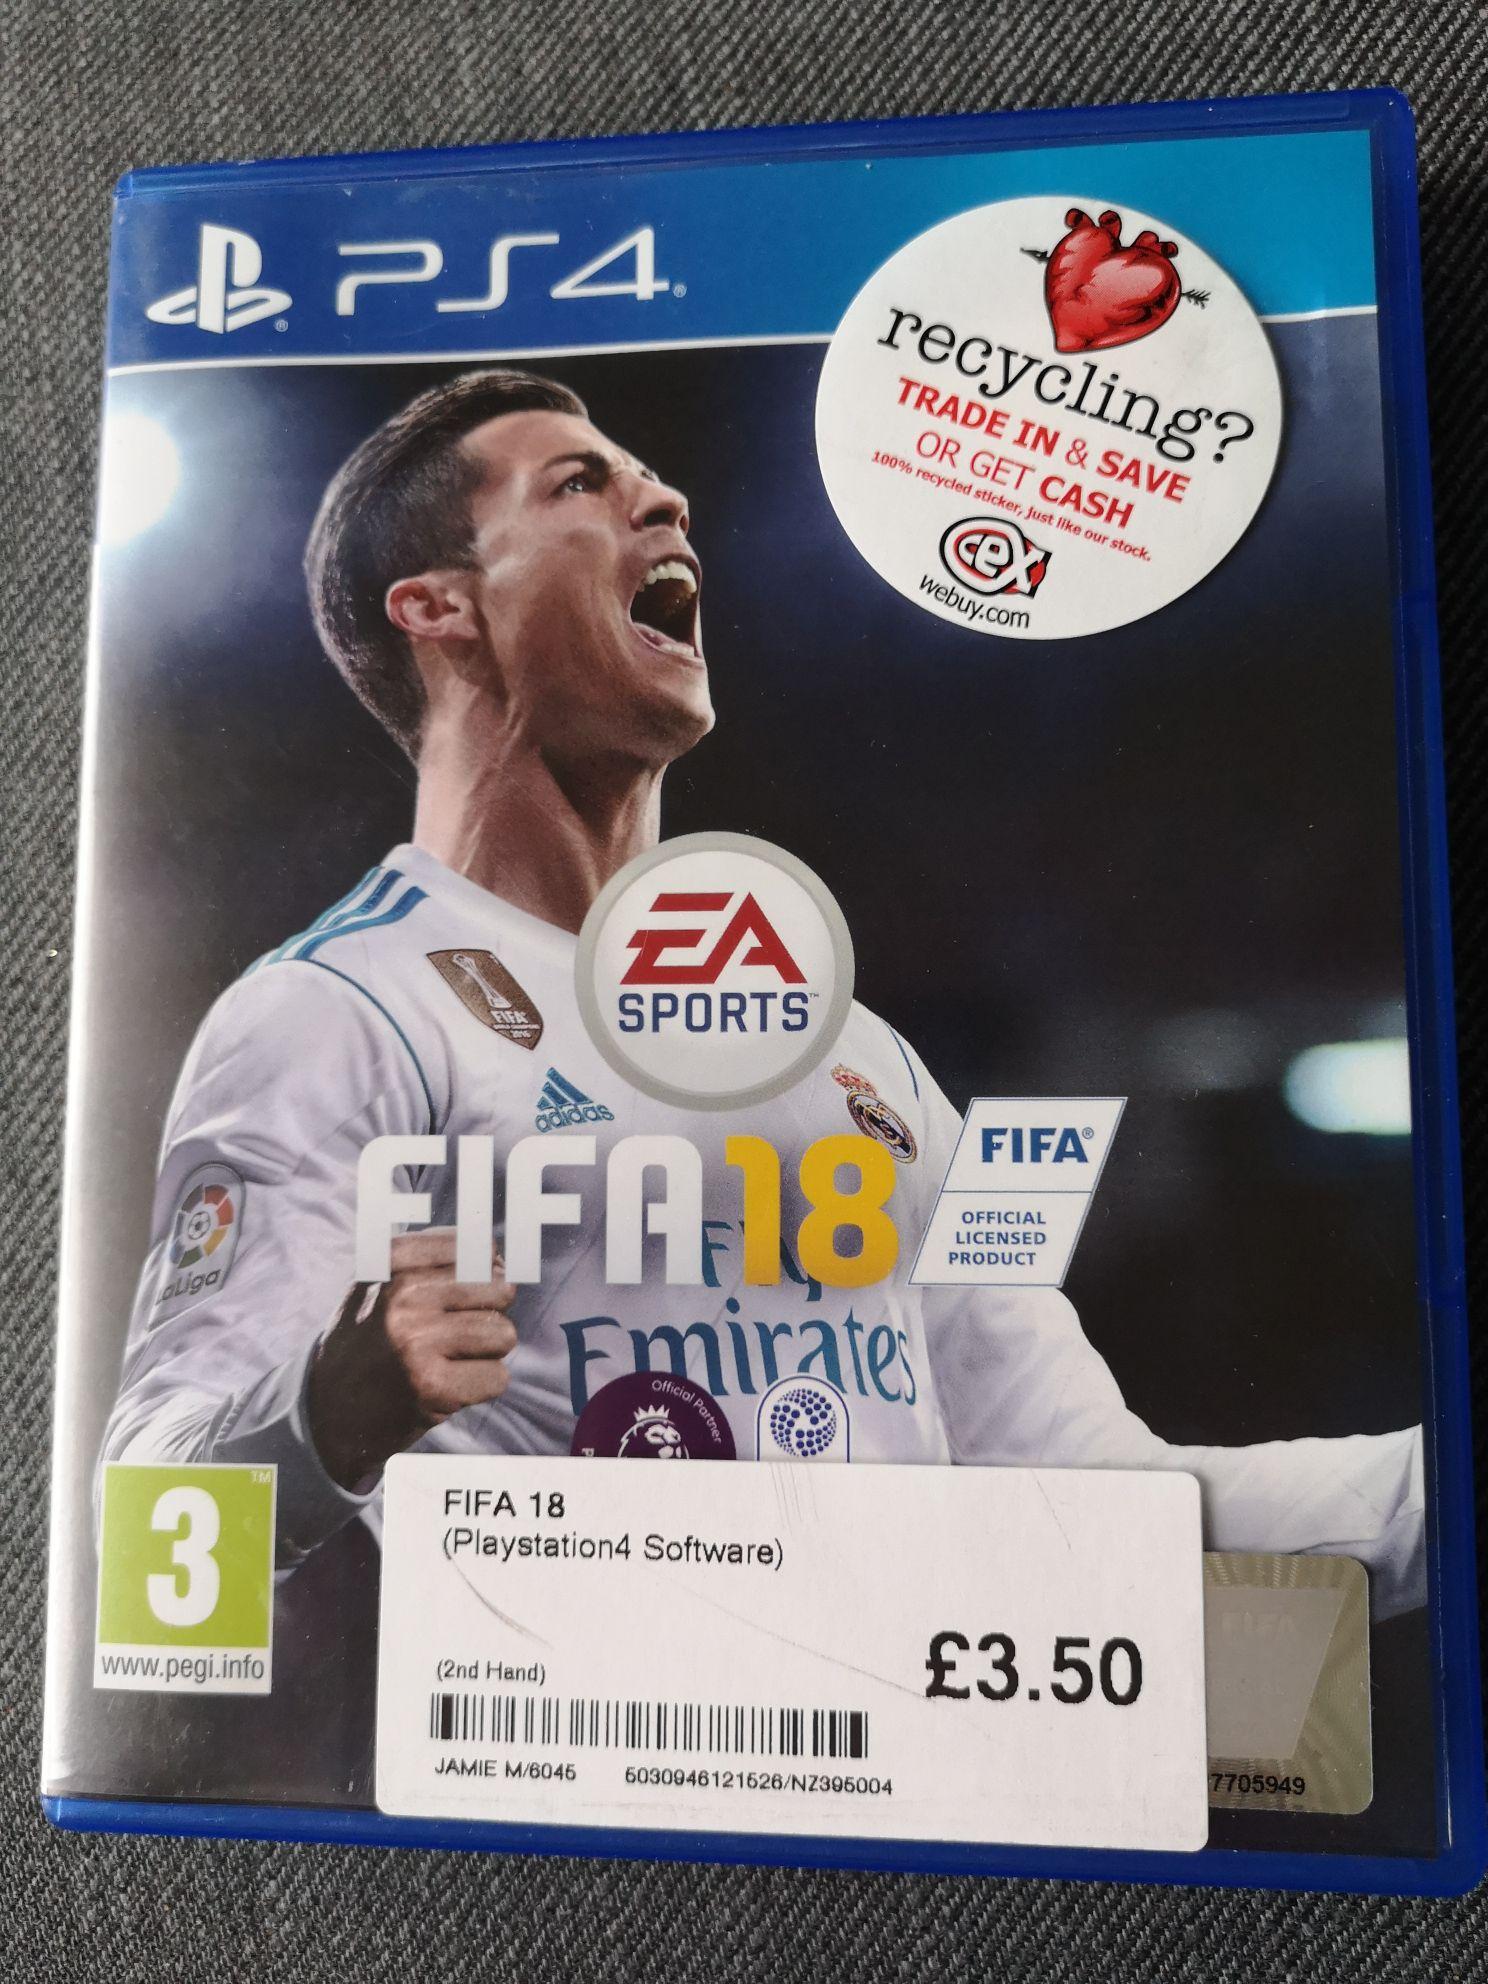 FIFA 18 PS4 £3.50 @ CEX Newtownabbey